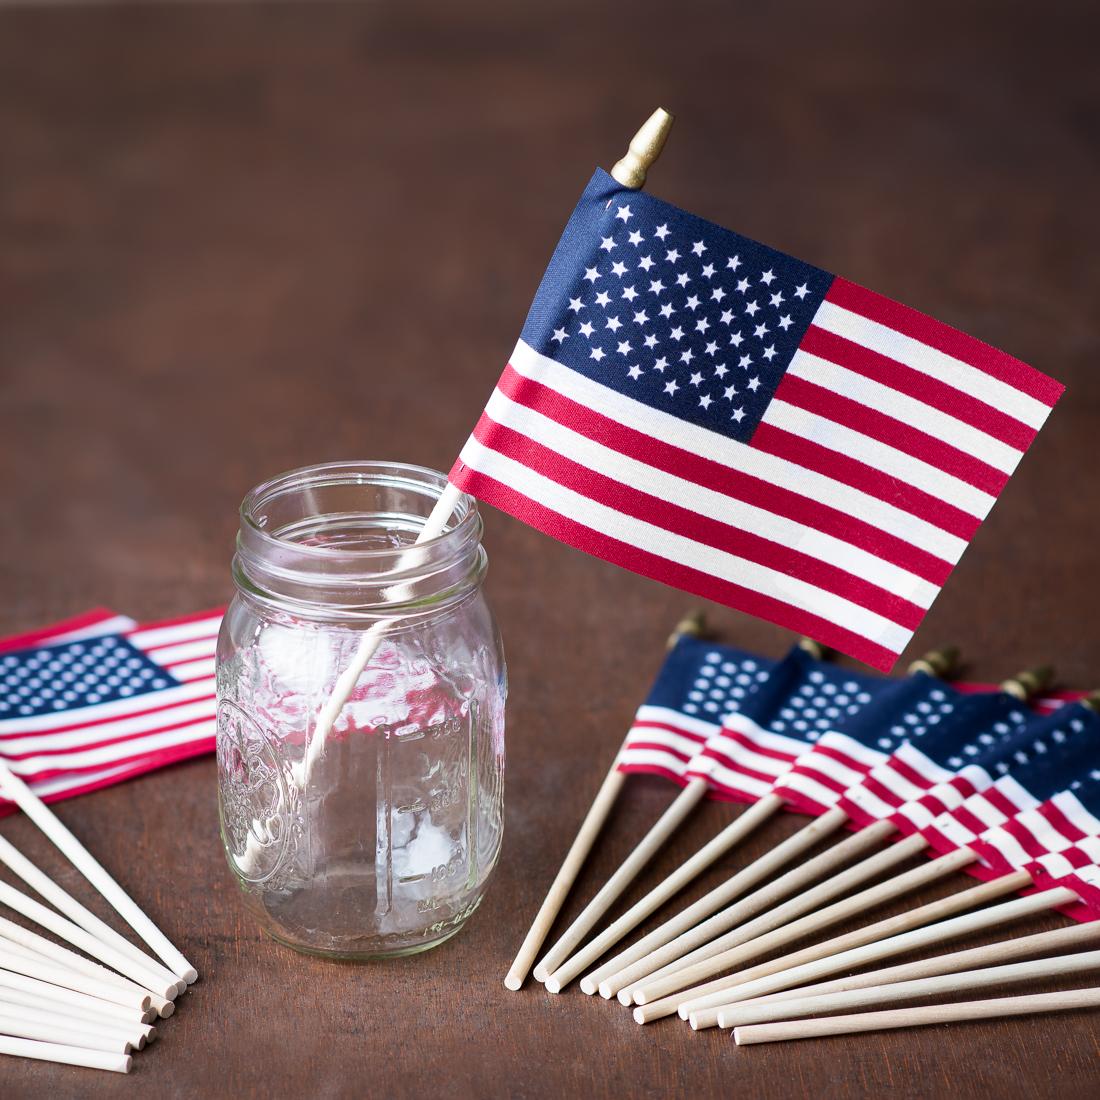 4 x 6 in. American Flags 24/pack